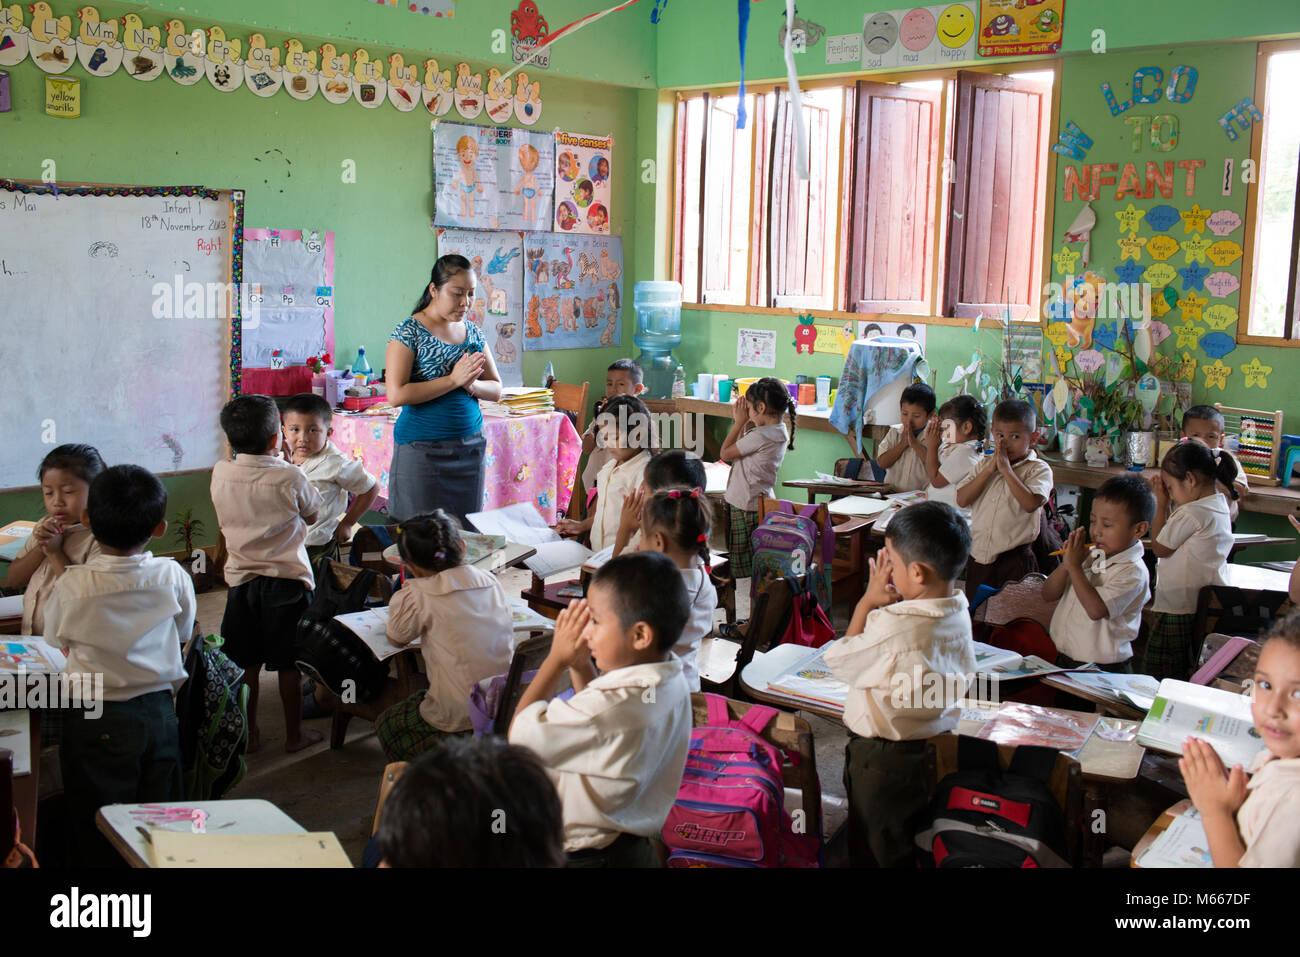 Yucatec Maya school children praying in their classroom with their teacher. San Antonio, Cayo District, Belize. - Stock Image